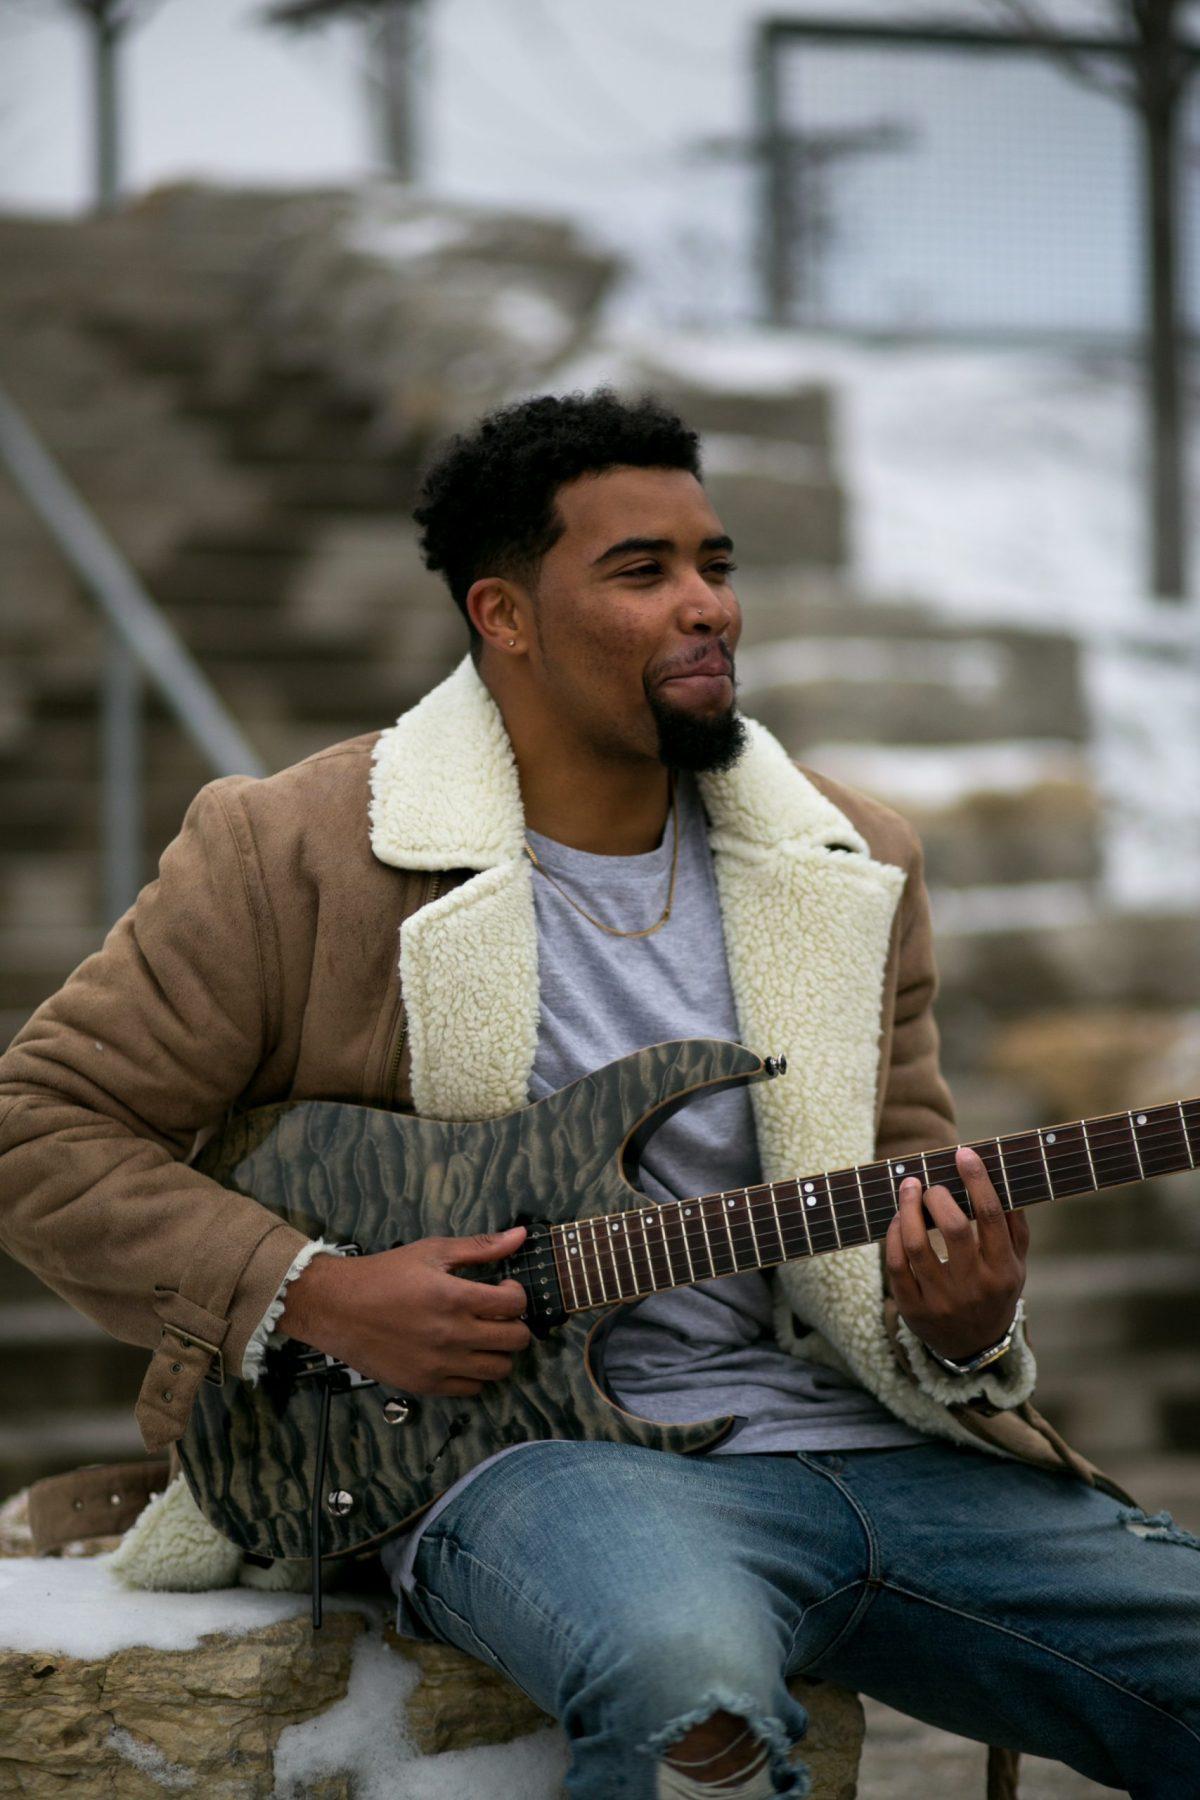 Guitarist Edward Vaughn, aka Rockstar E.V.